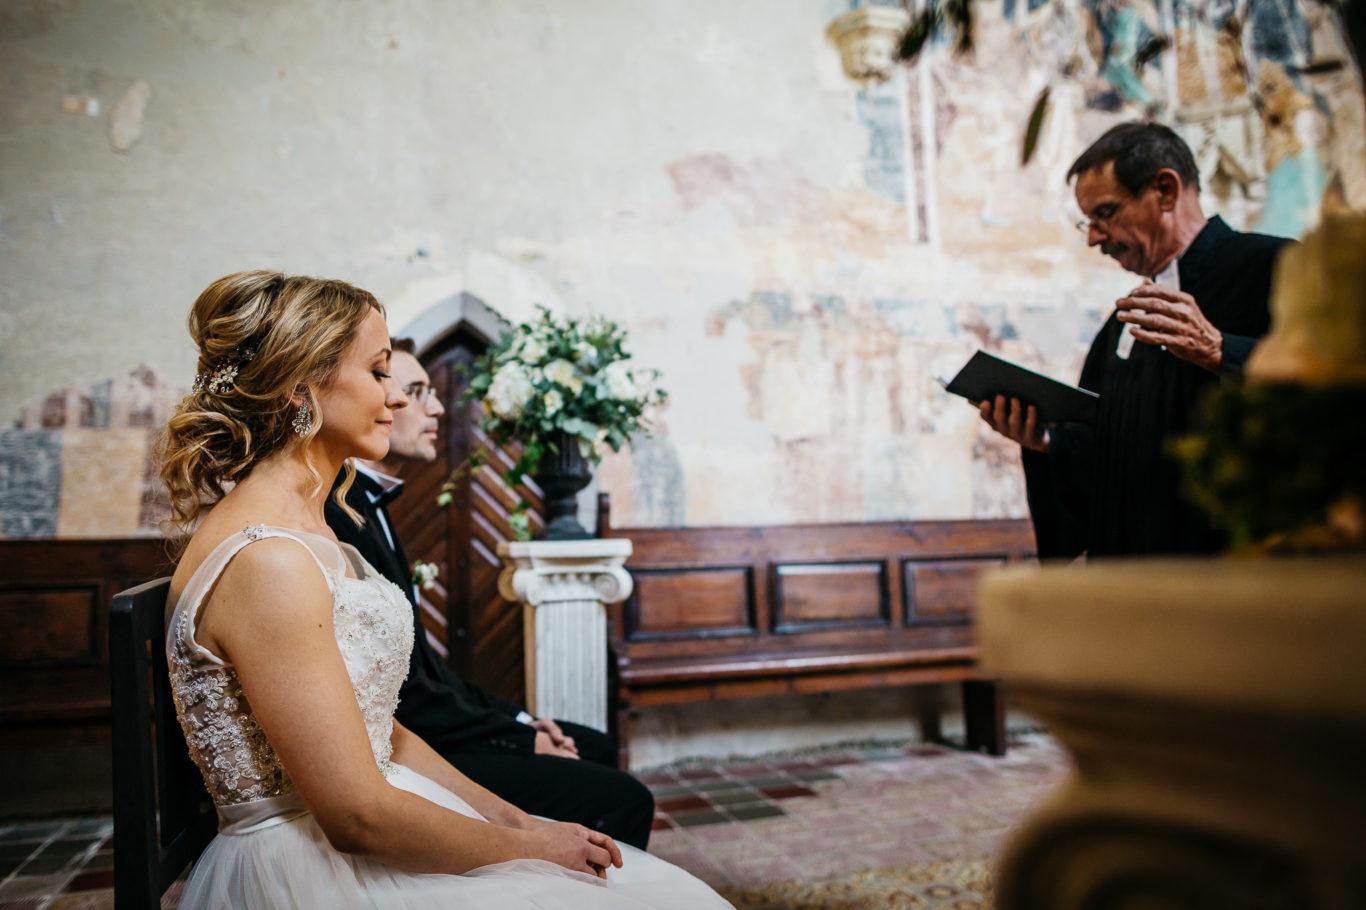 0213-fotografie-nunta-conacul-apafi-ana-simion-fotograf-ciprian-dumitrescu-cd2_0268